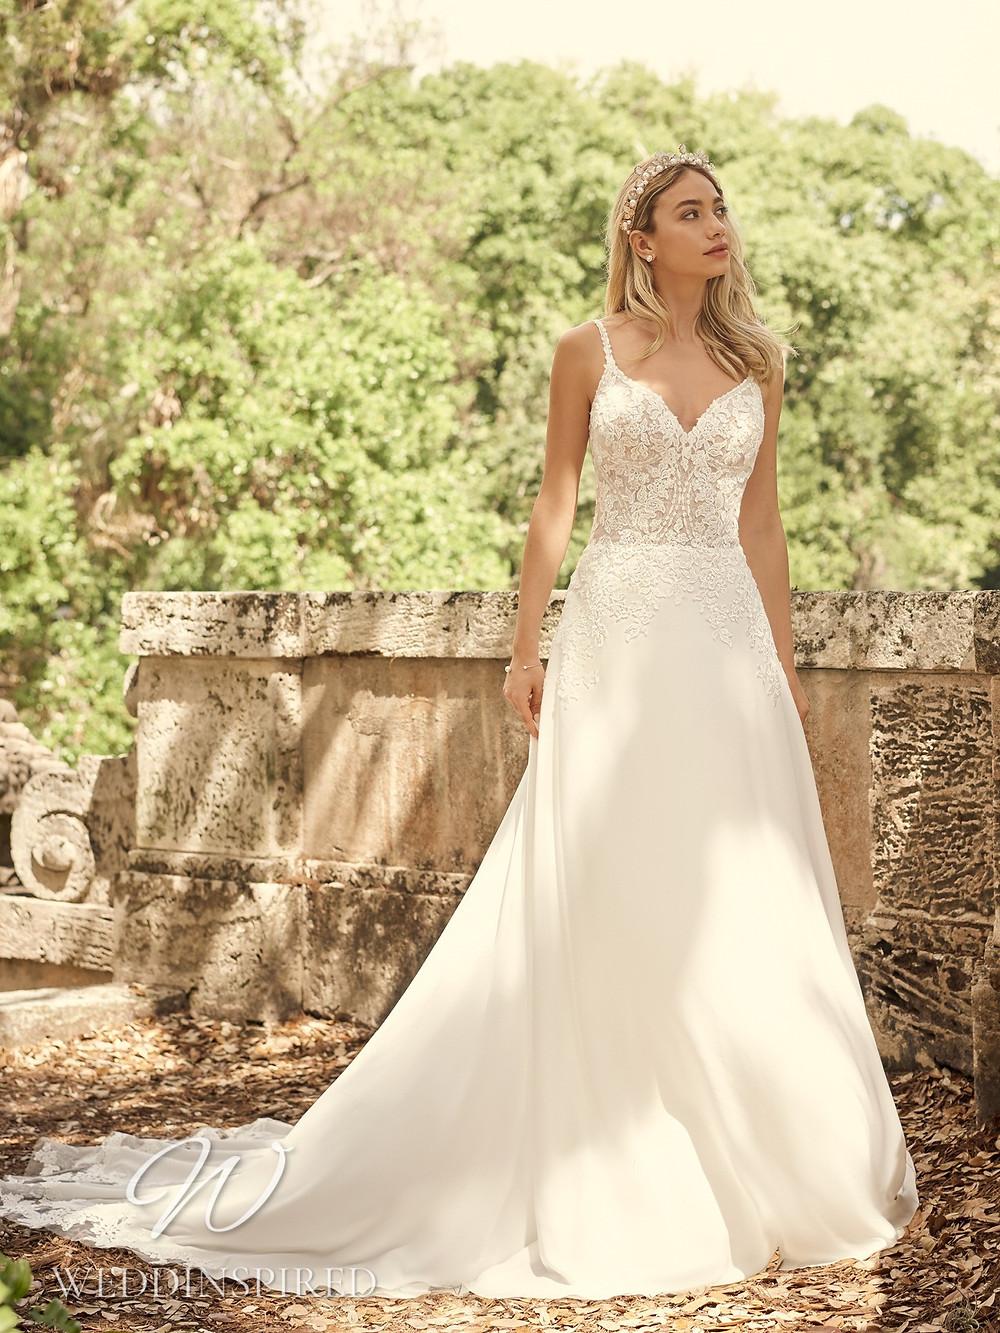 A Maggie Sottero 2021 lace and chiffon A-line wedding dress